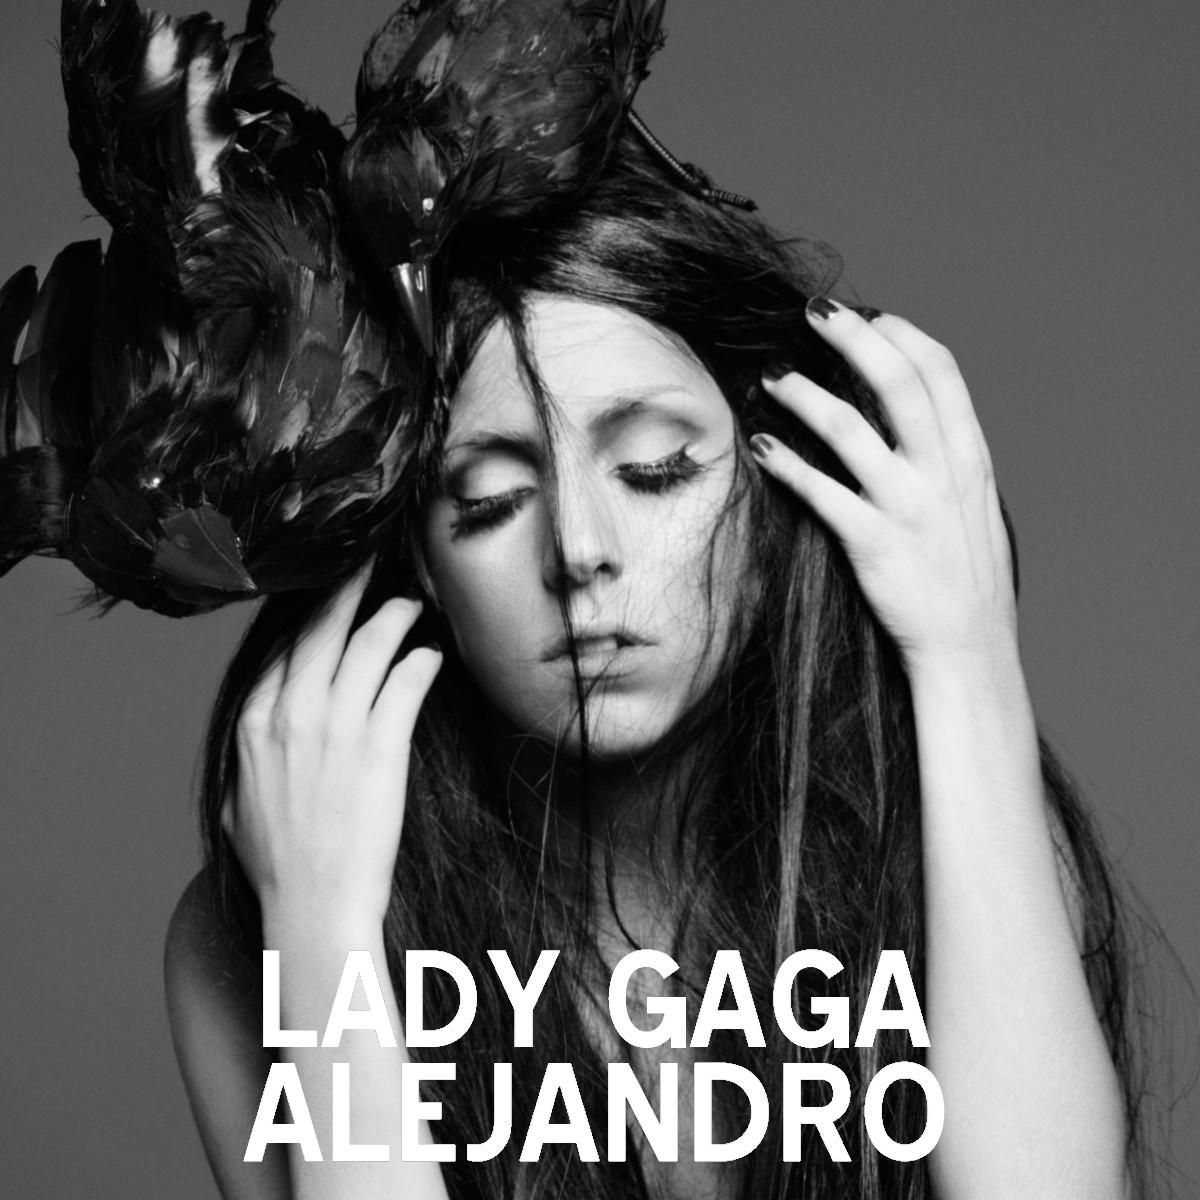 http://4.bp.blogspot.com/_d7ThRXDubC8/TB2Rp2IJfOI/AAAAAAAAAGI/VoUbaEuQlpY/s1600/Alejandro+-+Lady+GaGa.jpg